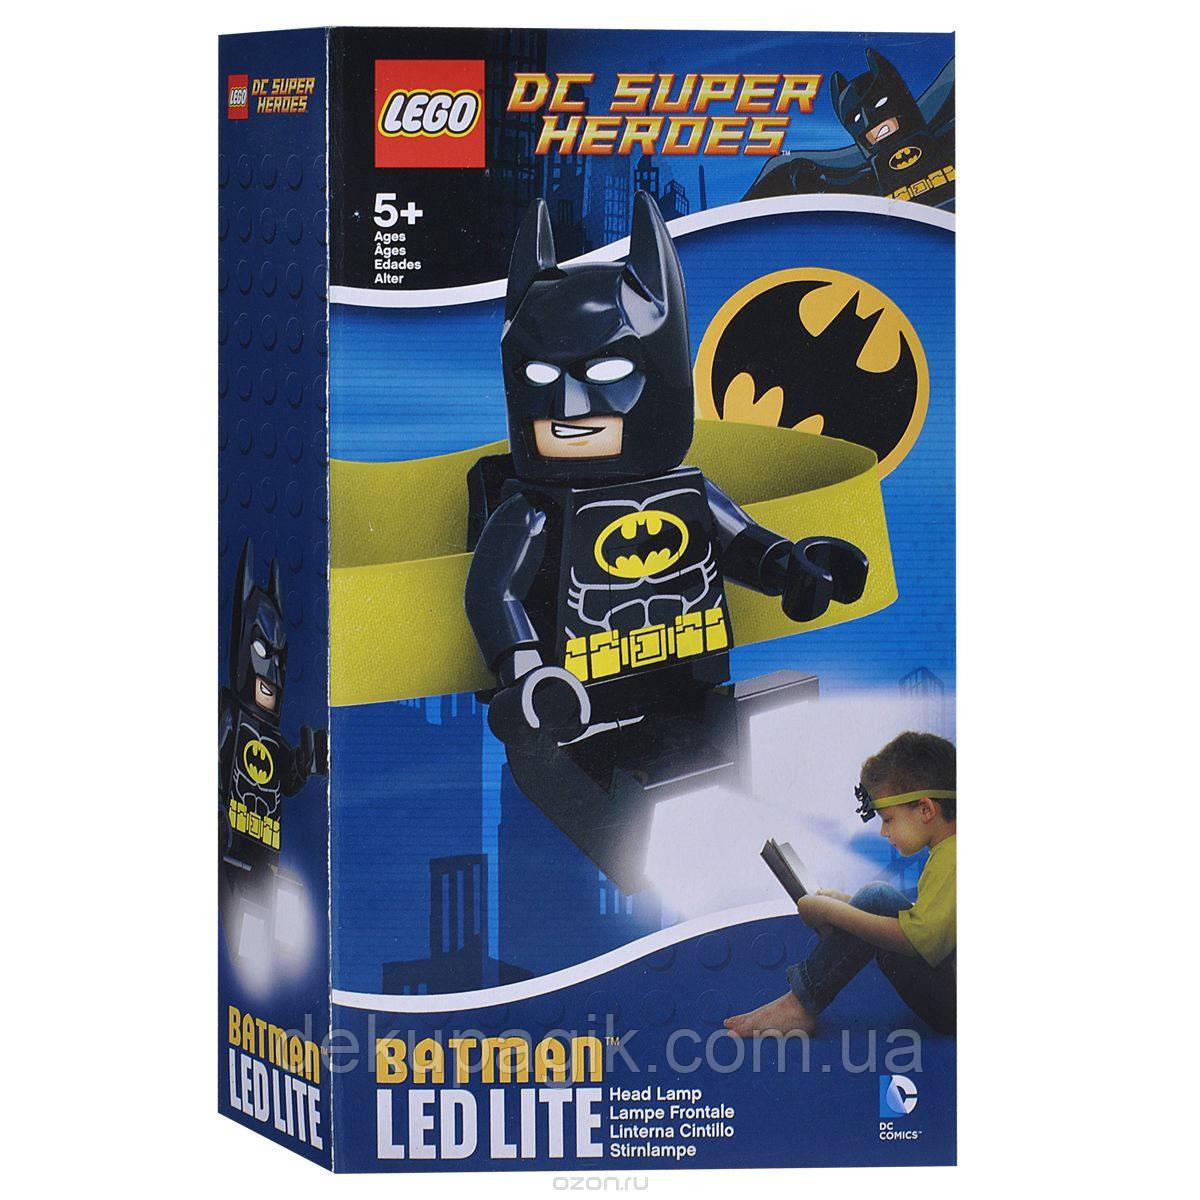 Лего фонарик Супер Герои Бэтмен налобный LGL-HE8